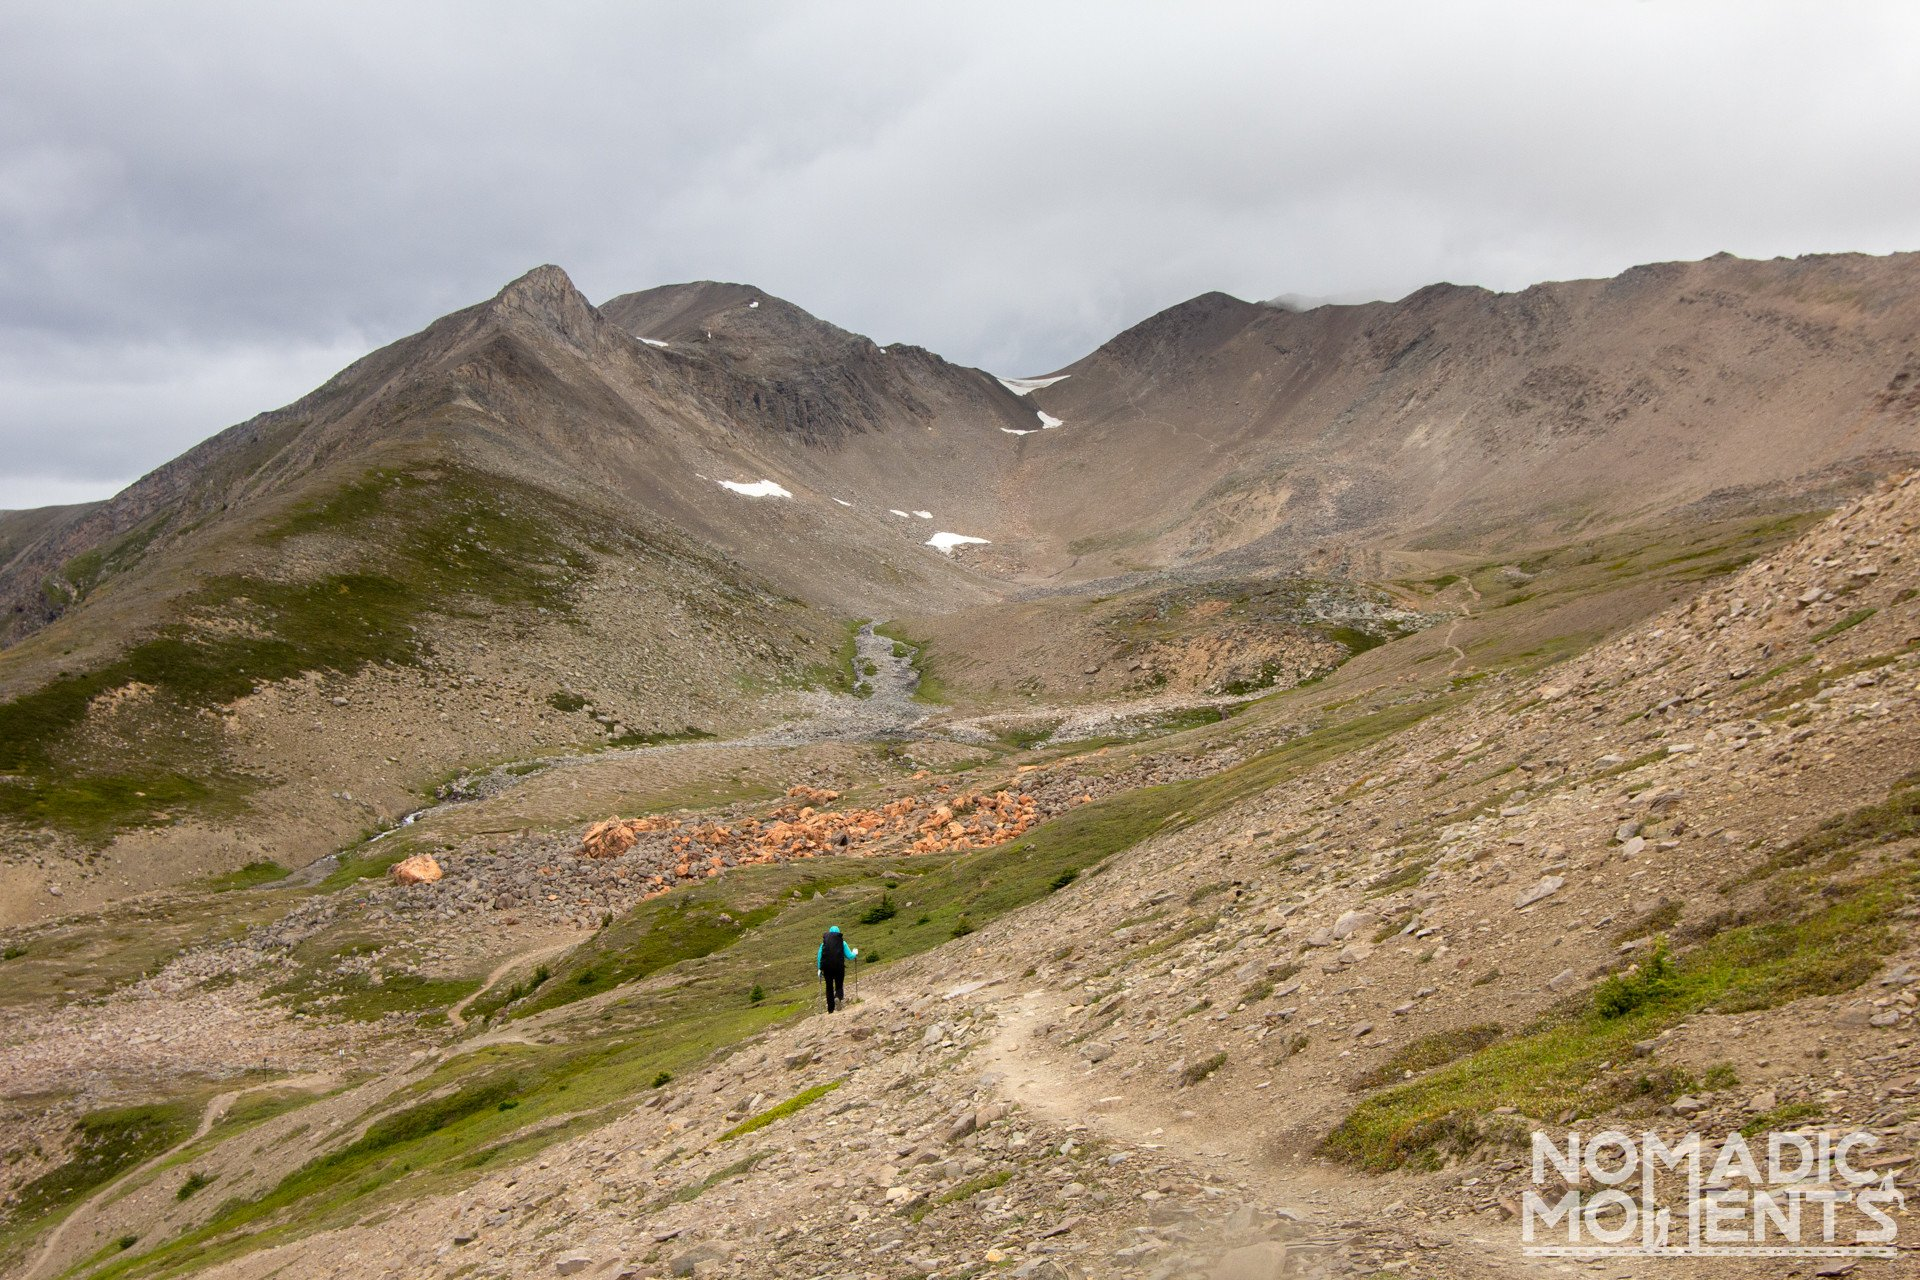 Hiking the Skyline Trail & The Notch